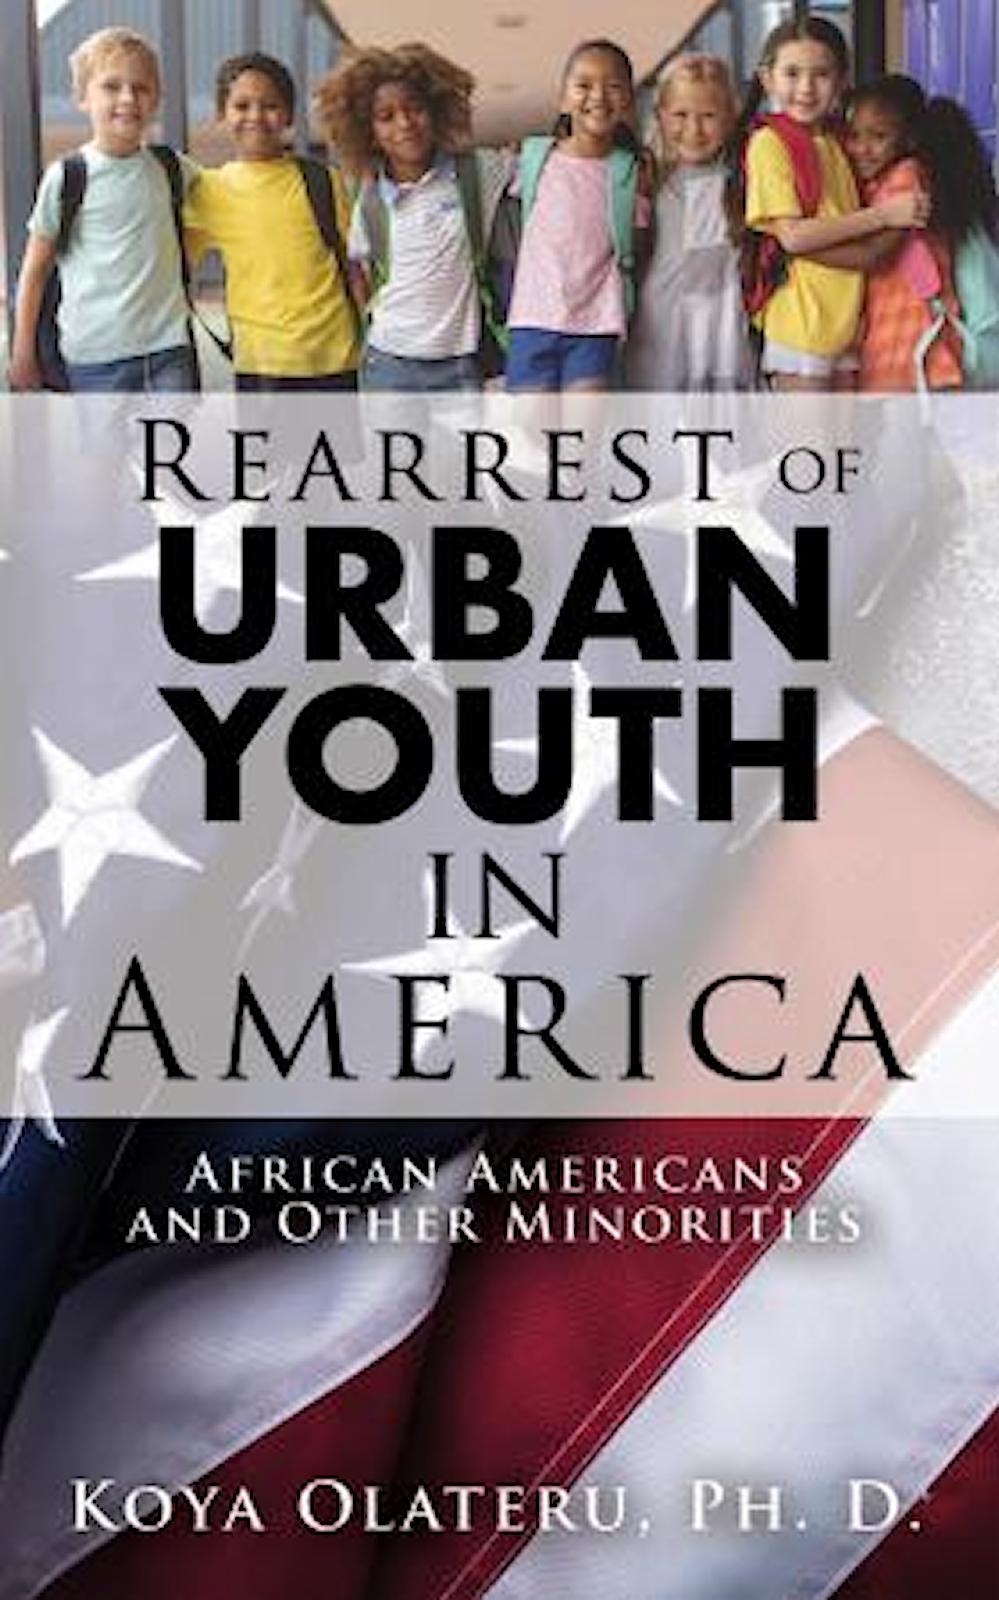 Rearrest of Urban Youth in America African-Americans and Other Minorities By Adekoya (Koya) Olateru-Olagbegi, Ph. D.